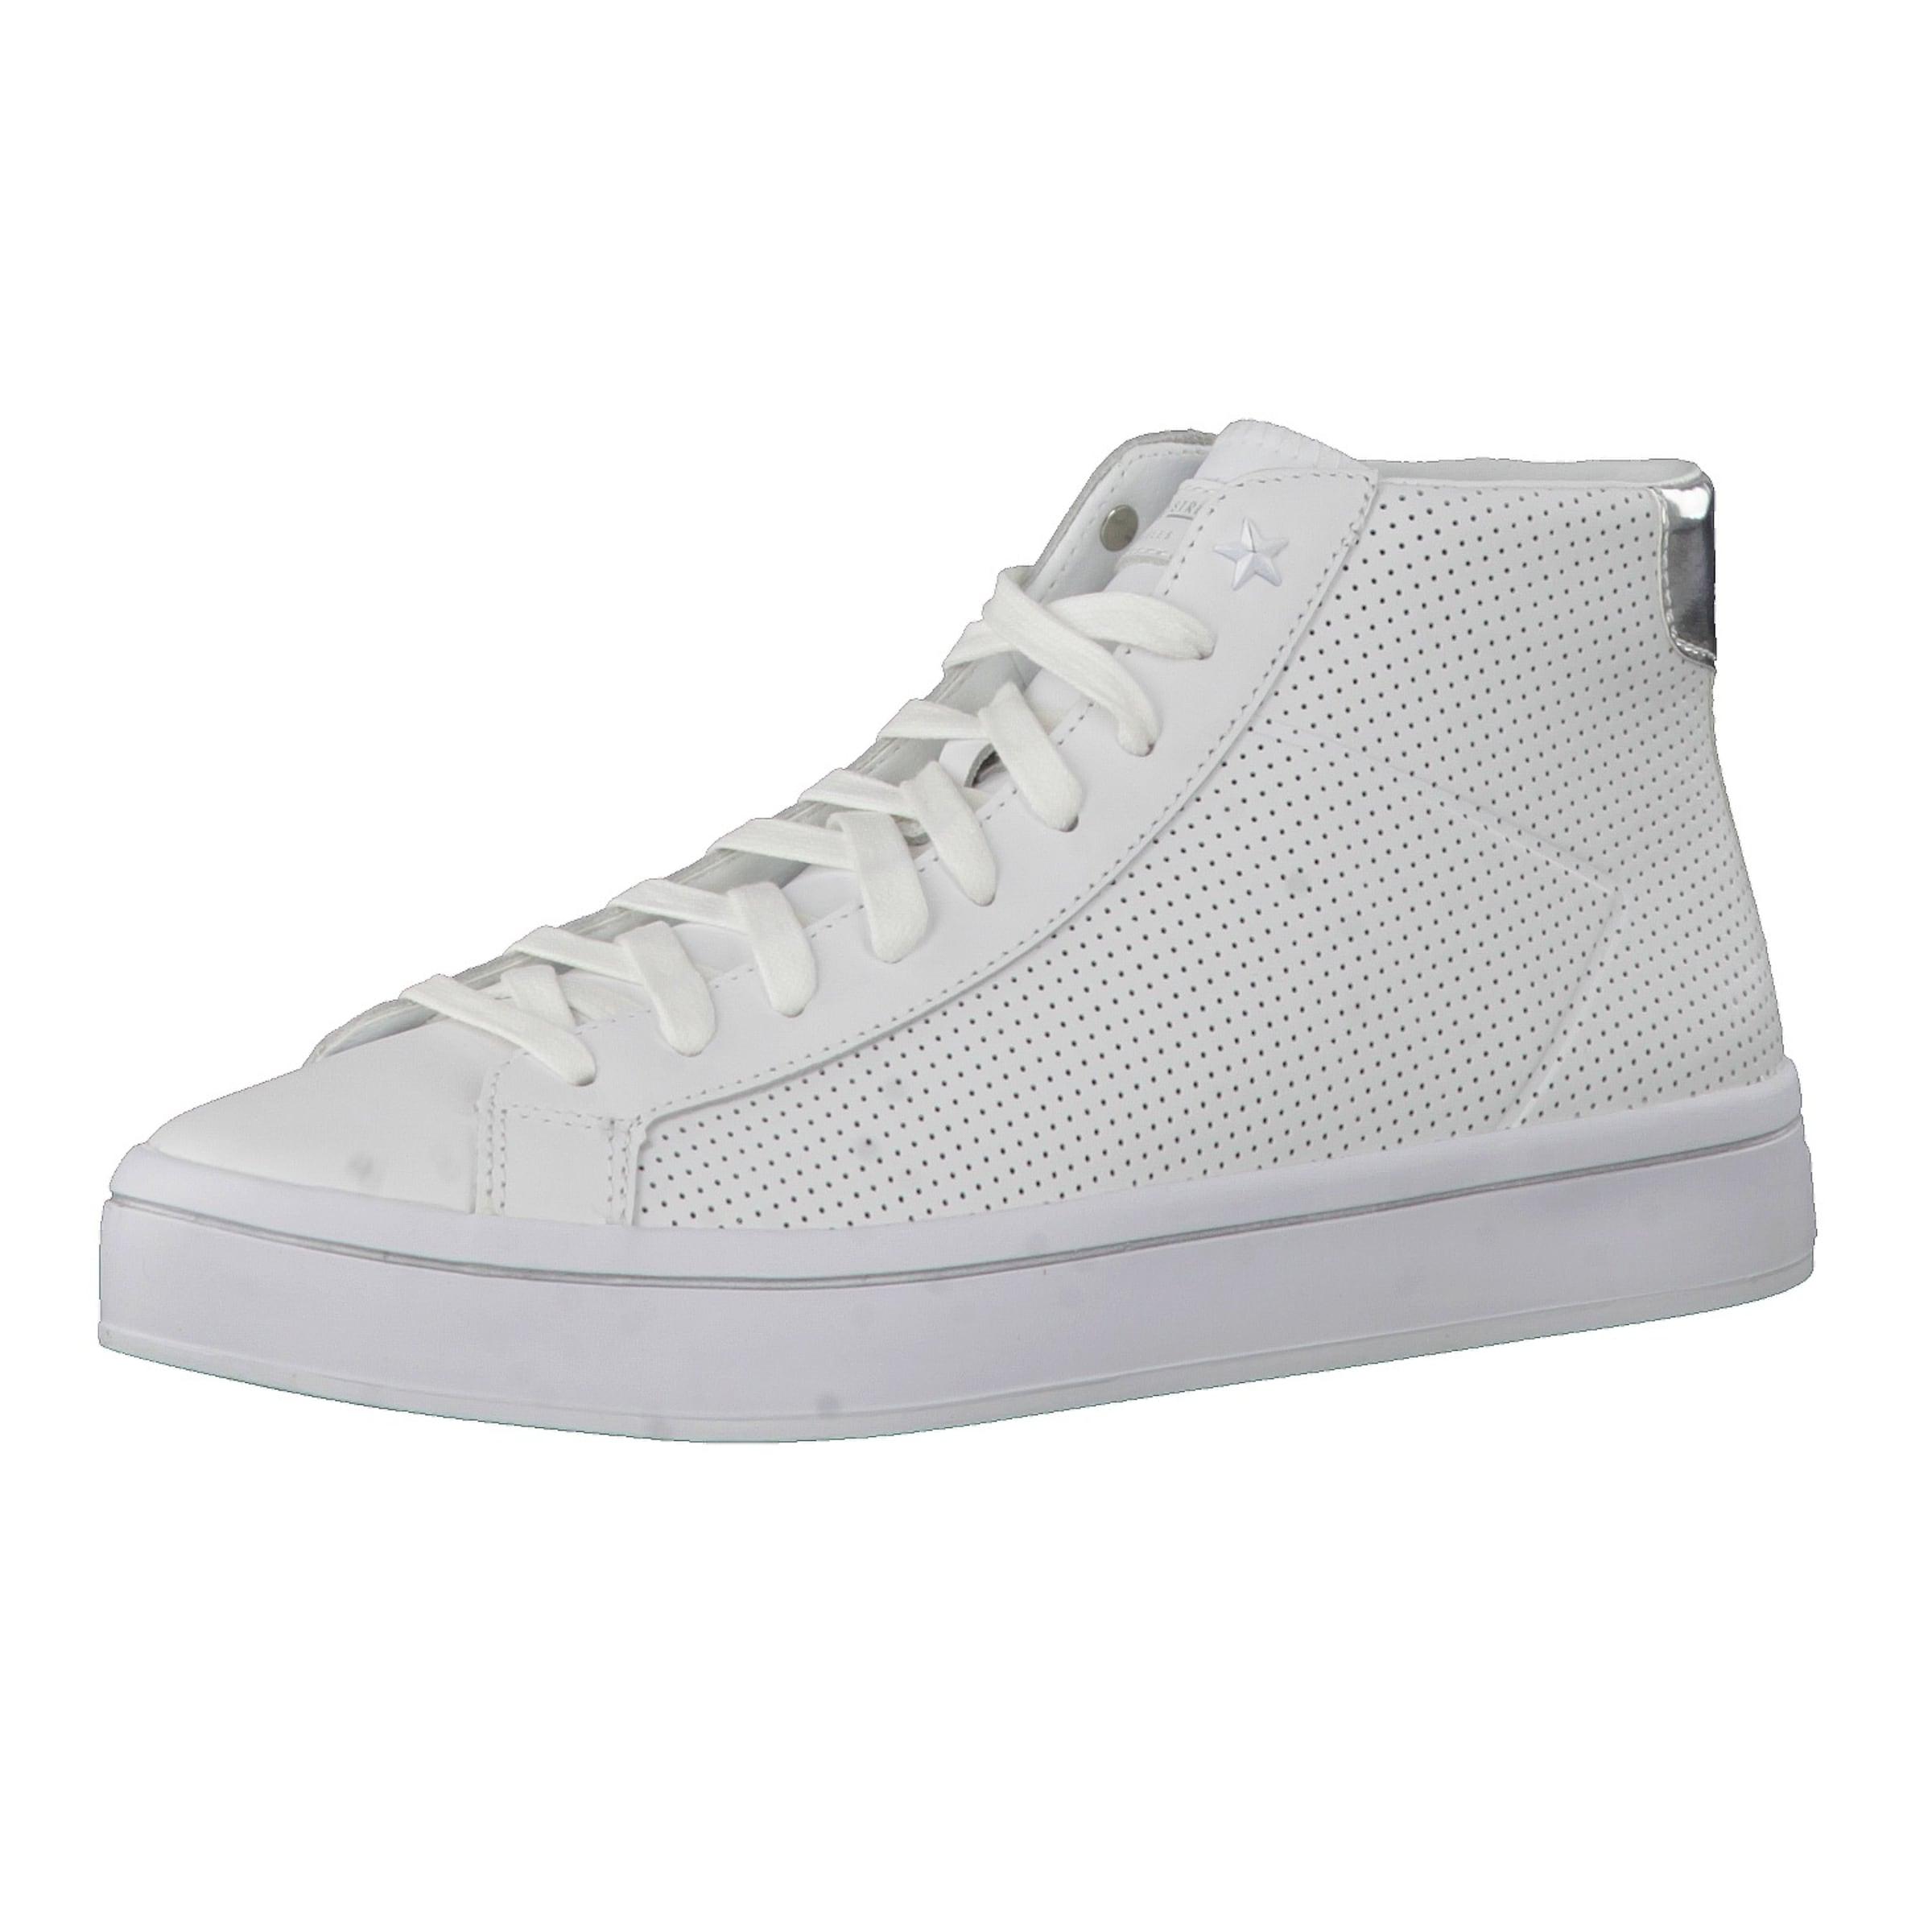 SKECHERS Sneaker Hi-Lite – No Dice mit profilierter Laufsohle 940-WHT